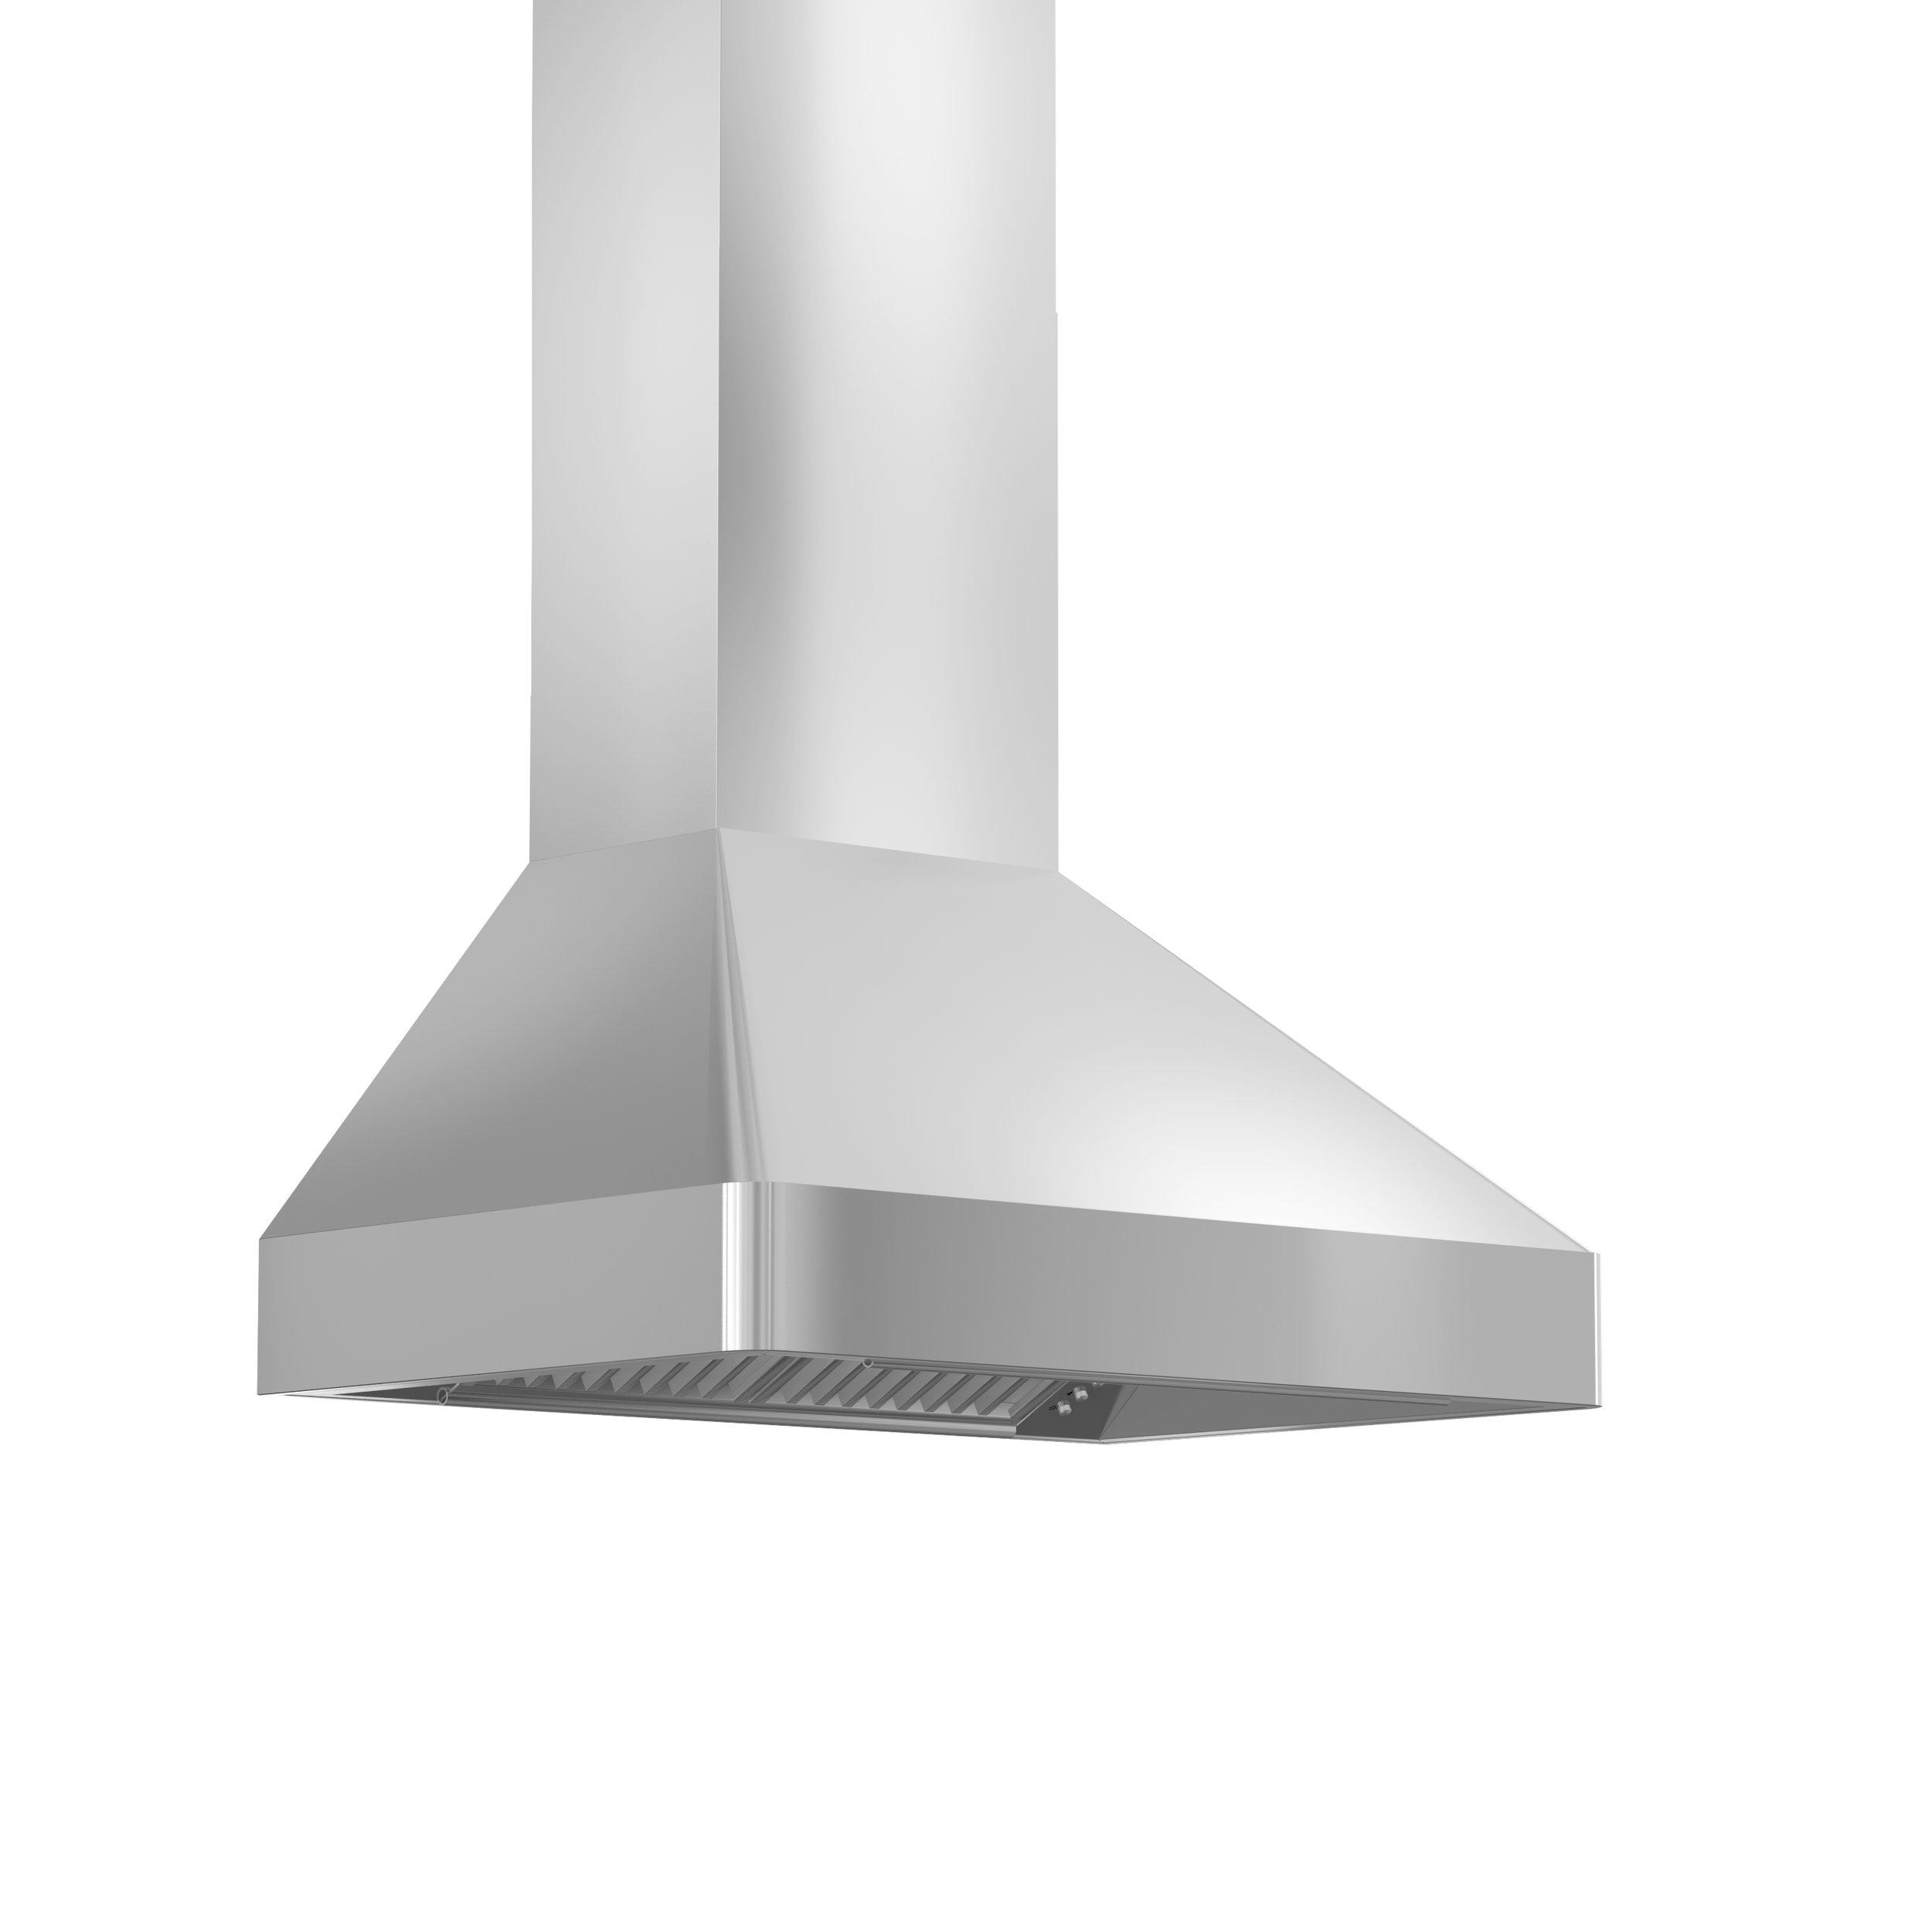 zline-stainless-steel-wall-mounted-range-hood-9597-main.jpg